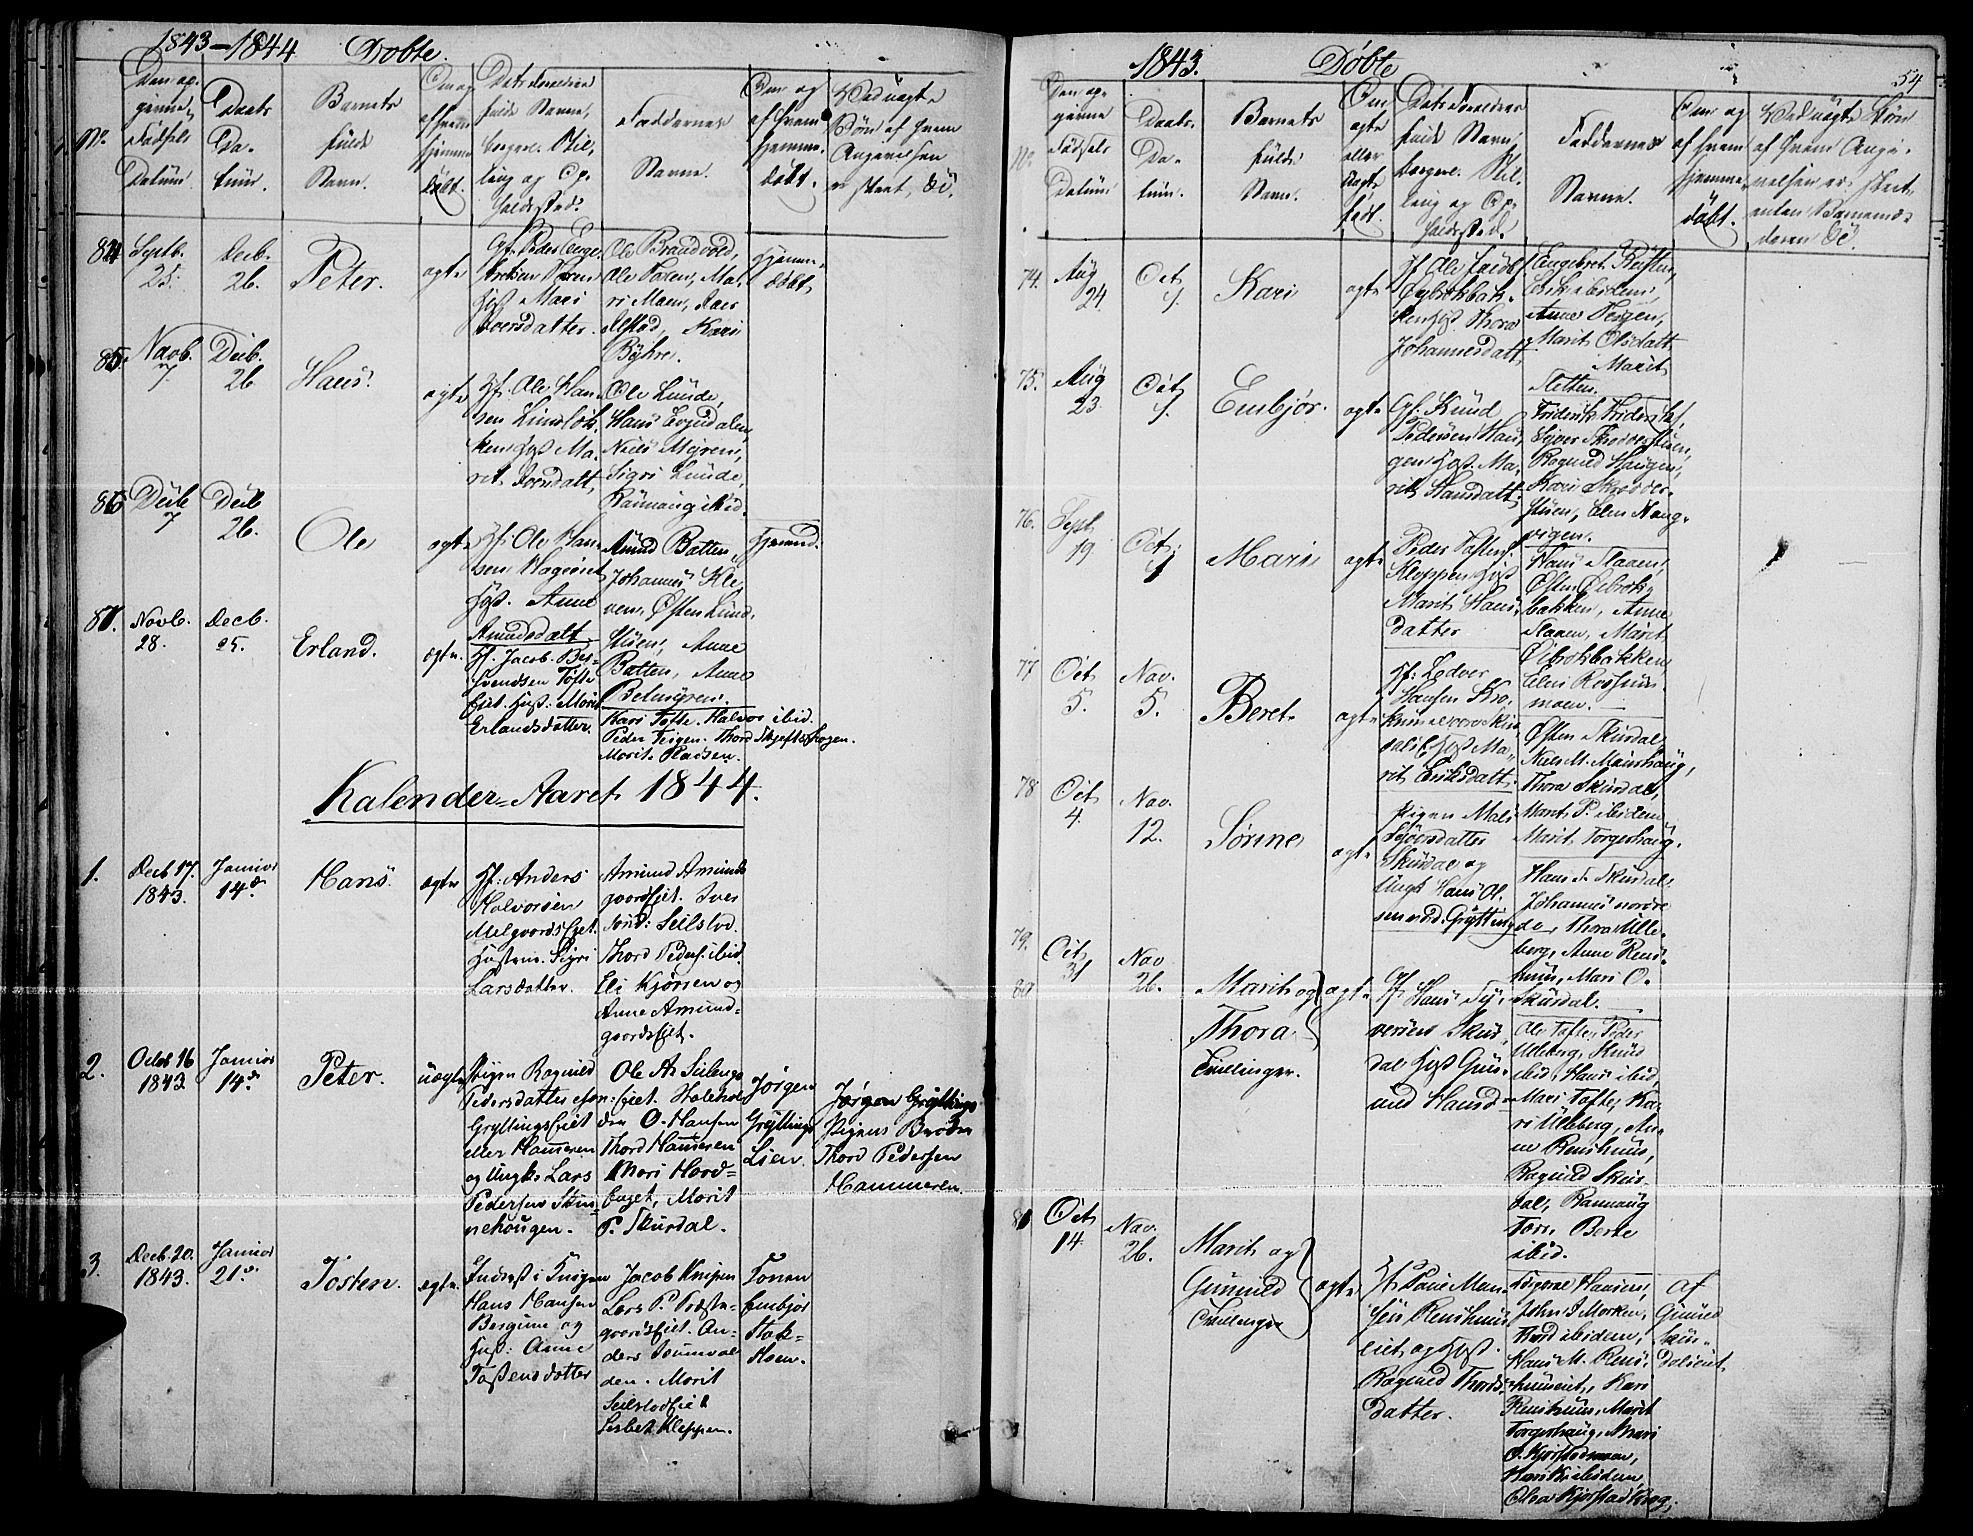 SAH, Fron prestekontor, H/Ha/Haa/L0004: Ministerialbok nr. 4, 1839-1848, s. 54